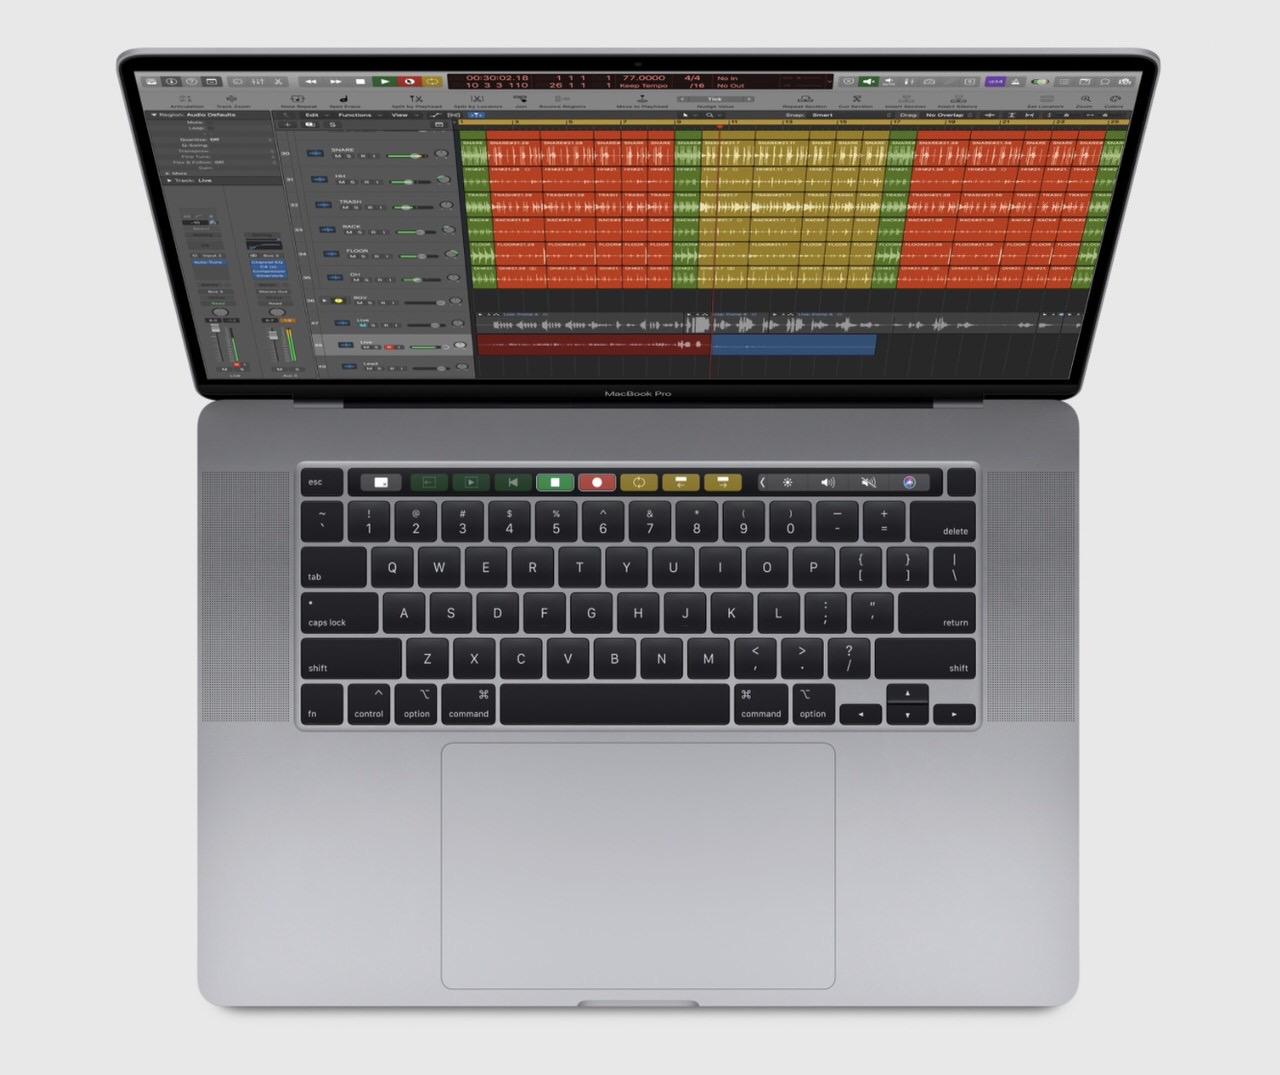 Apple、新型「MacBook Pro 14/16インチ」は新しいディスプレイ・MagSafe復活・Touch Bar廃止か?